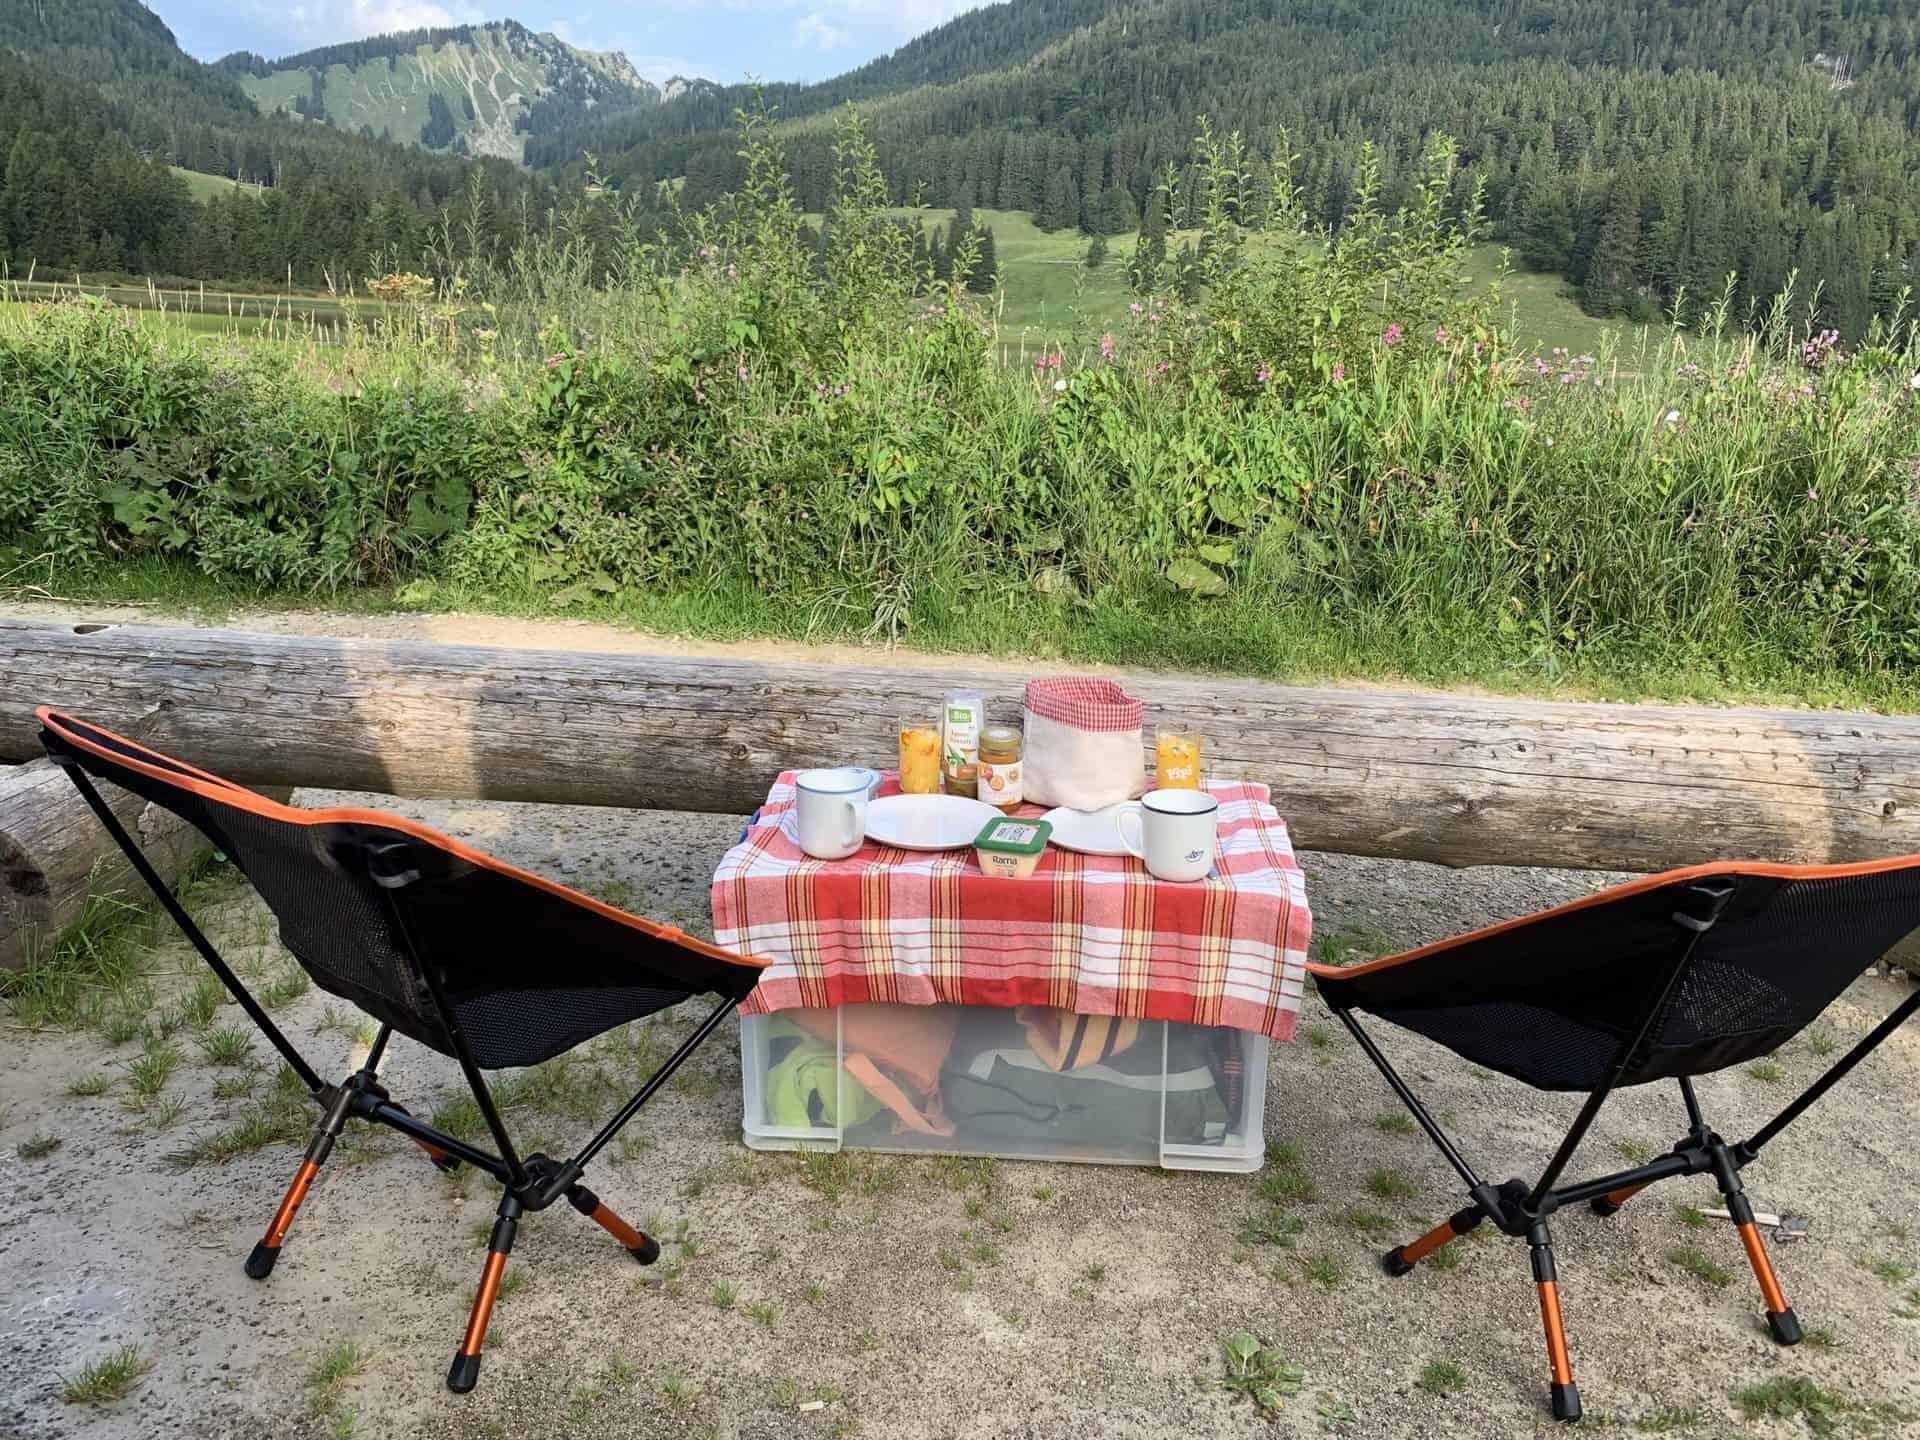 Campingsitze_klappbar_klein